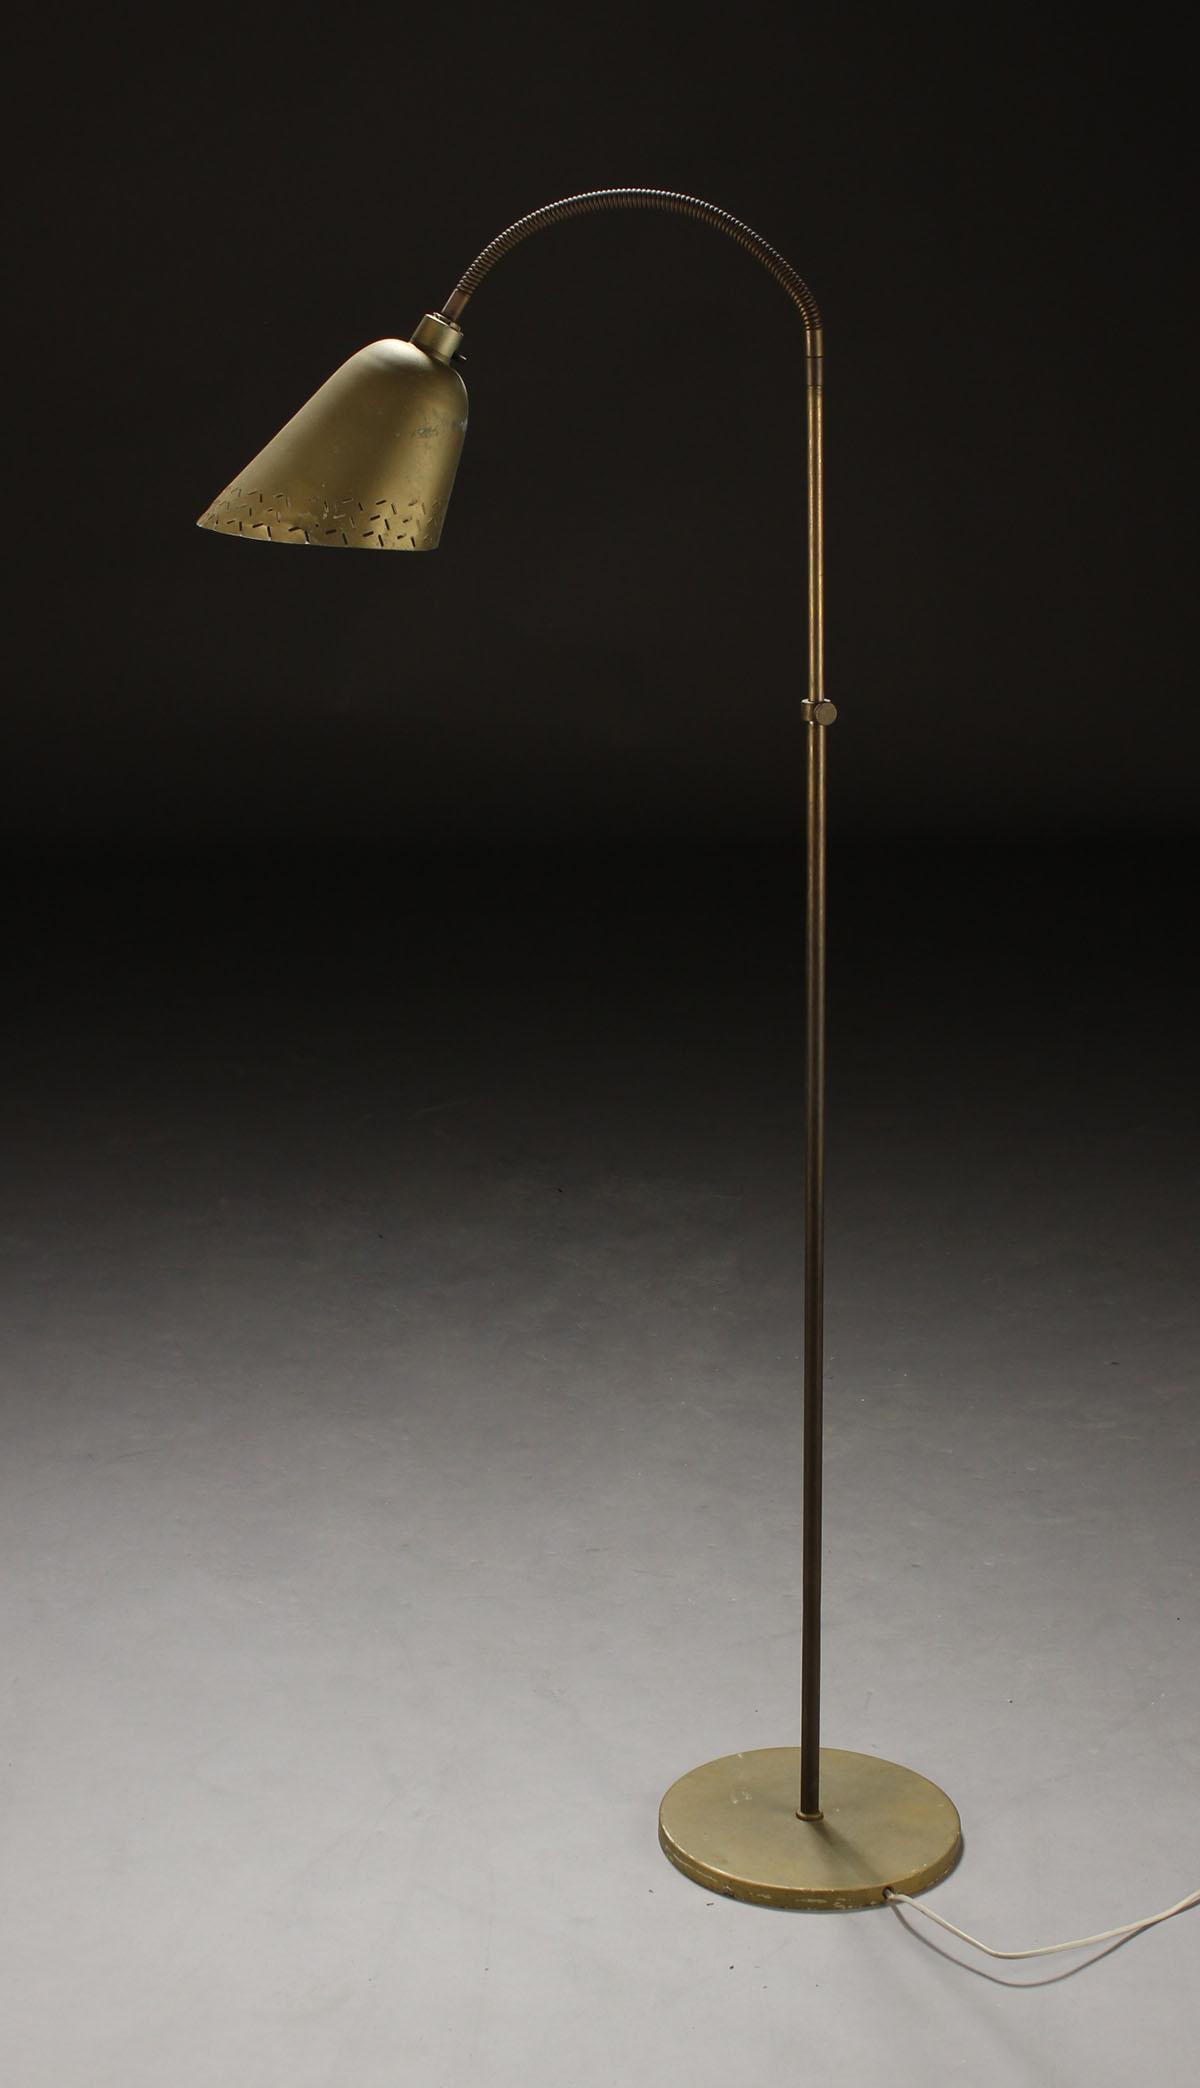 Vare 3996255 Arne Jacobsen, Bellevue standerlampe, messing